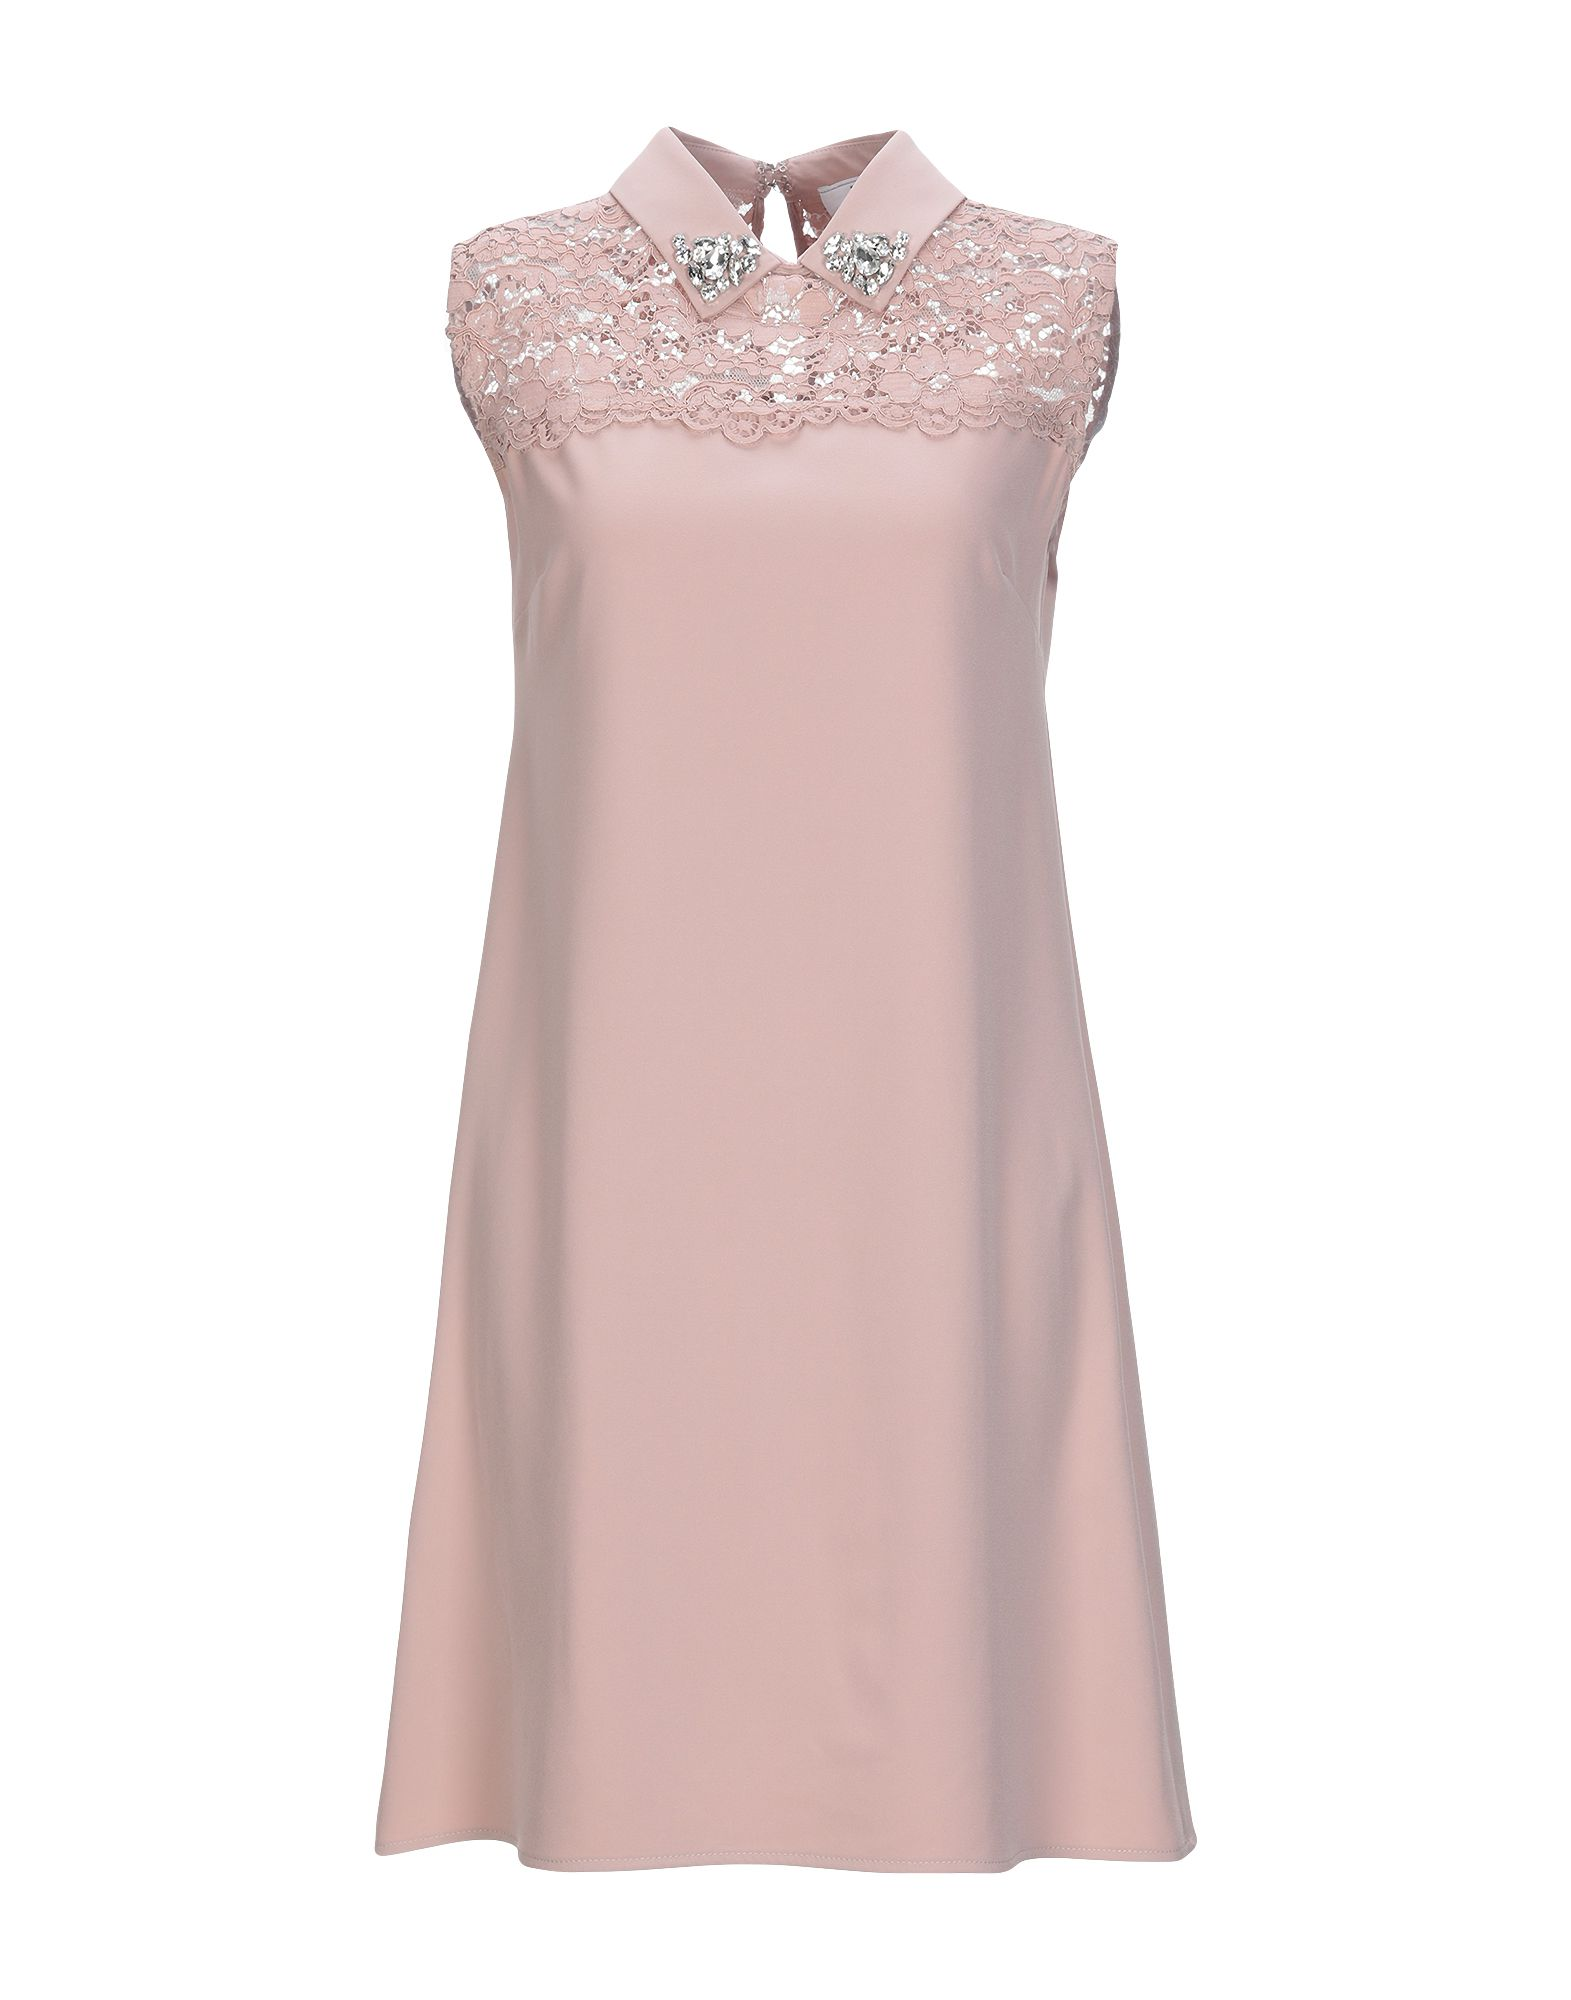 BLUGIRL BLUMARINE Sleeveless Nightgown Blue NWT $150